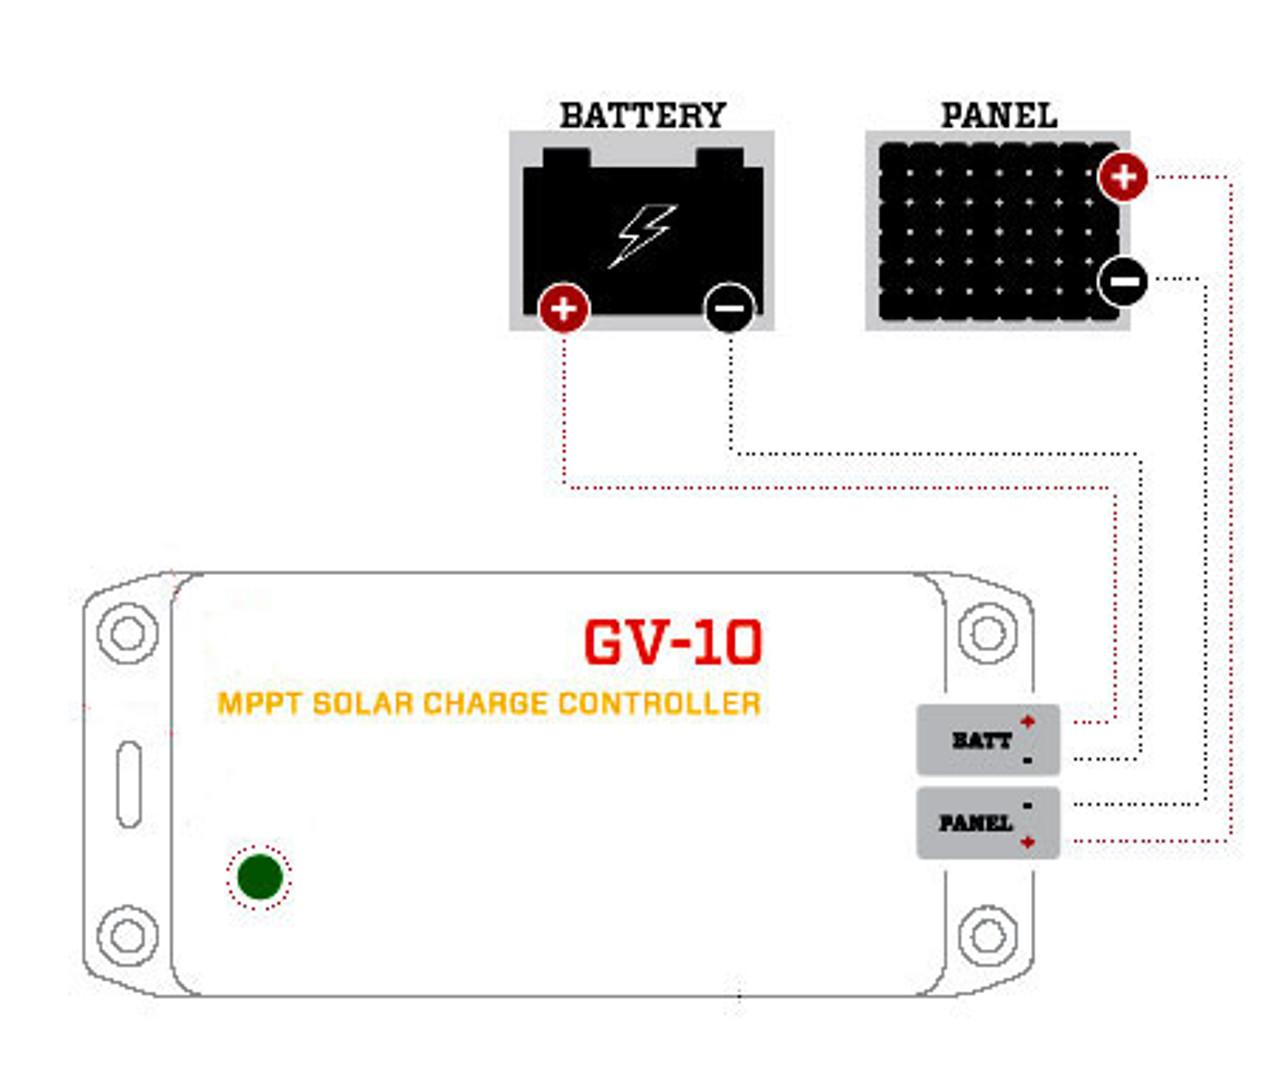 GV-10 | 140W 10.5A Genasun MPPT Solar Charge Controller - Pb - Diagram